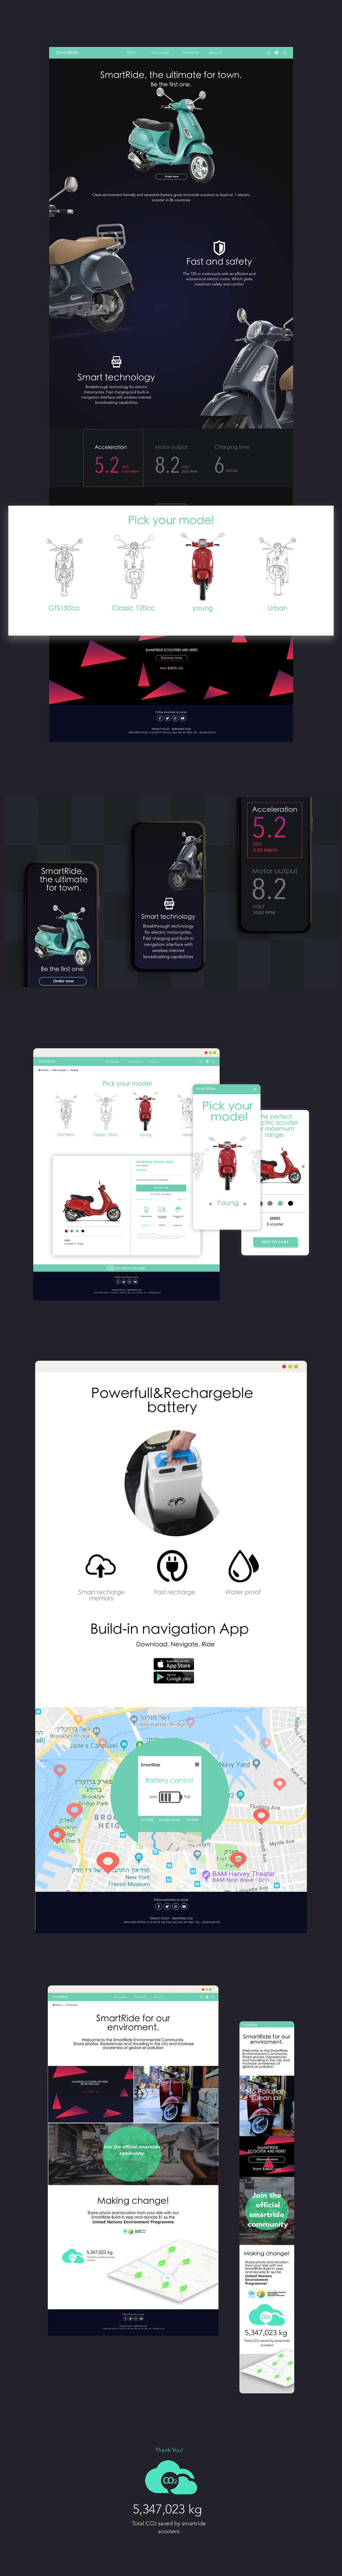 smart ride wix (1).jpg